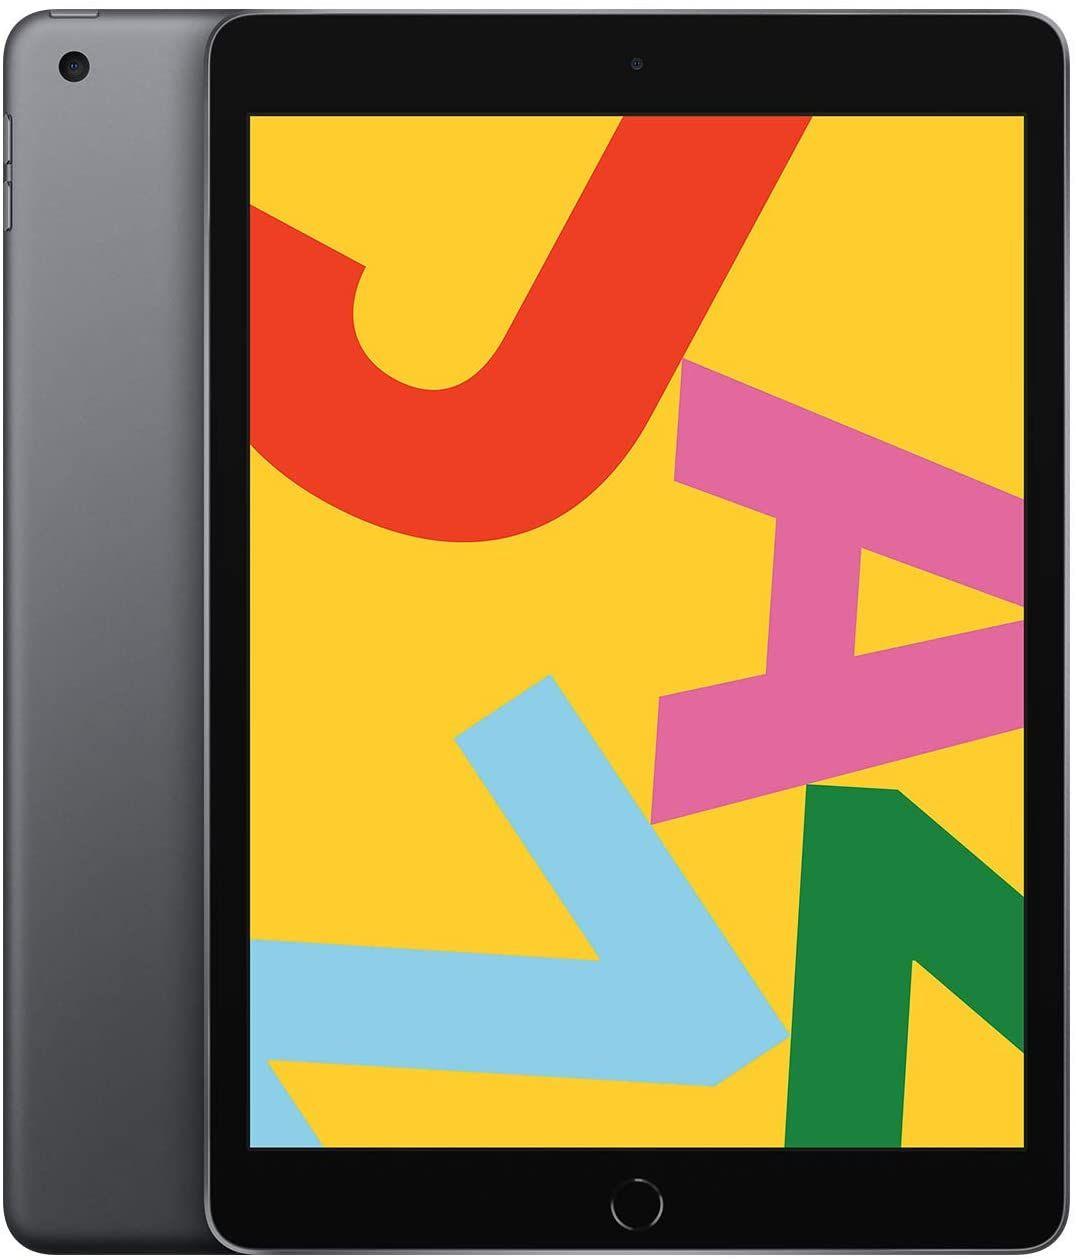 Apple iPad 2019 WiFi 32gb alle kleuren €329,-